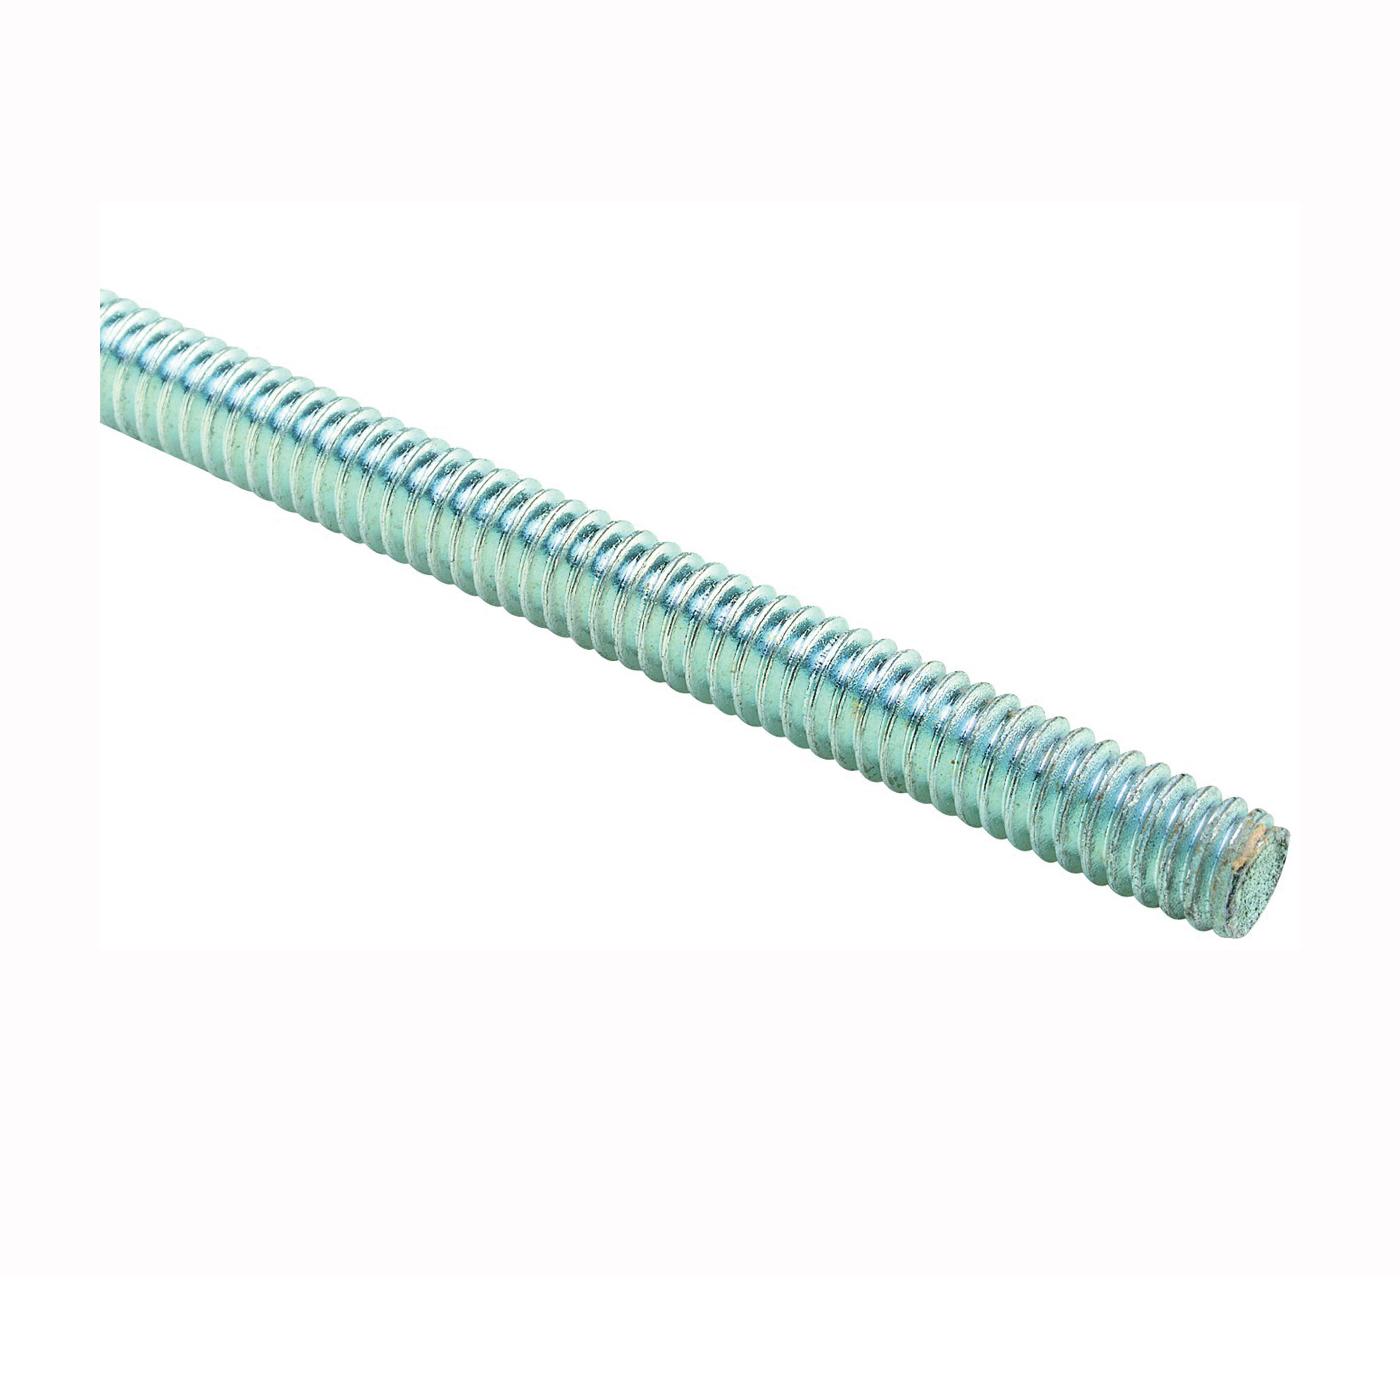 Picture of SuperStrut R Series ZR1028 Threaded Rod, Steel, Galvanized